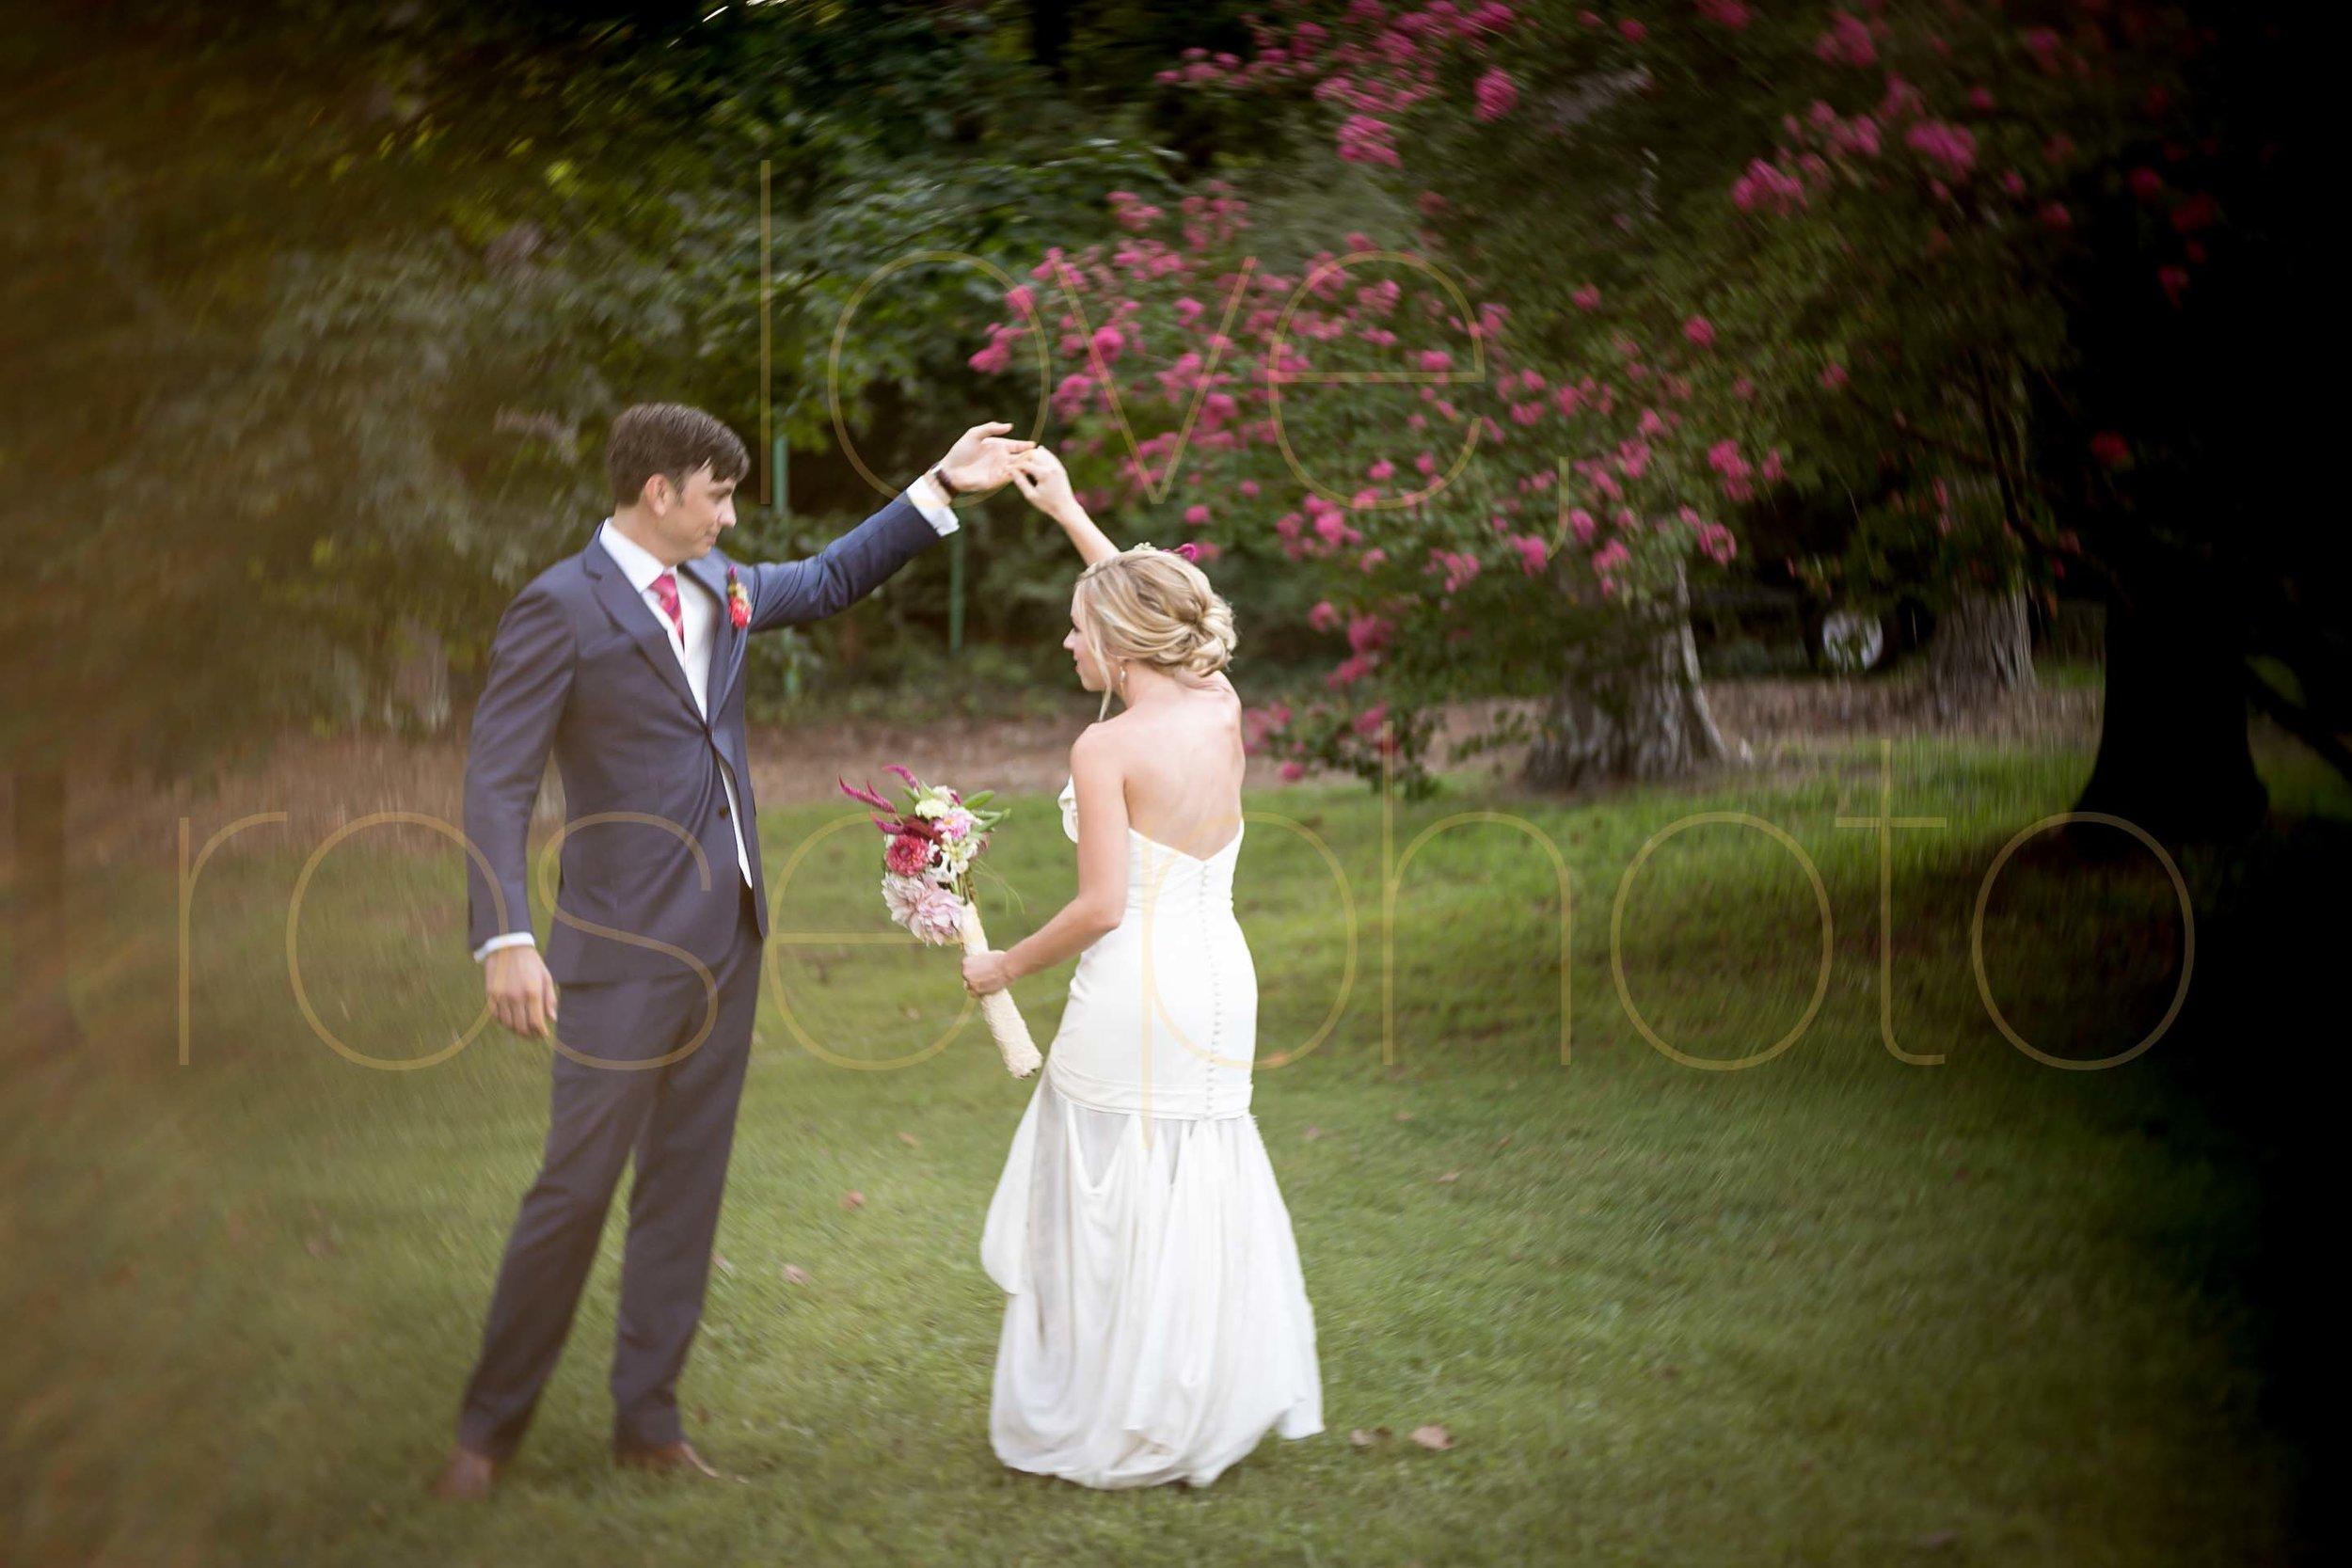 Rose Photo Asheville Wedding Photographer Nasheville Weddings Charleston Bride Chicago photojournalist weddings -52.jpg